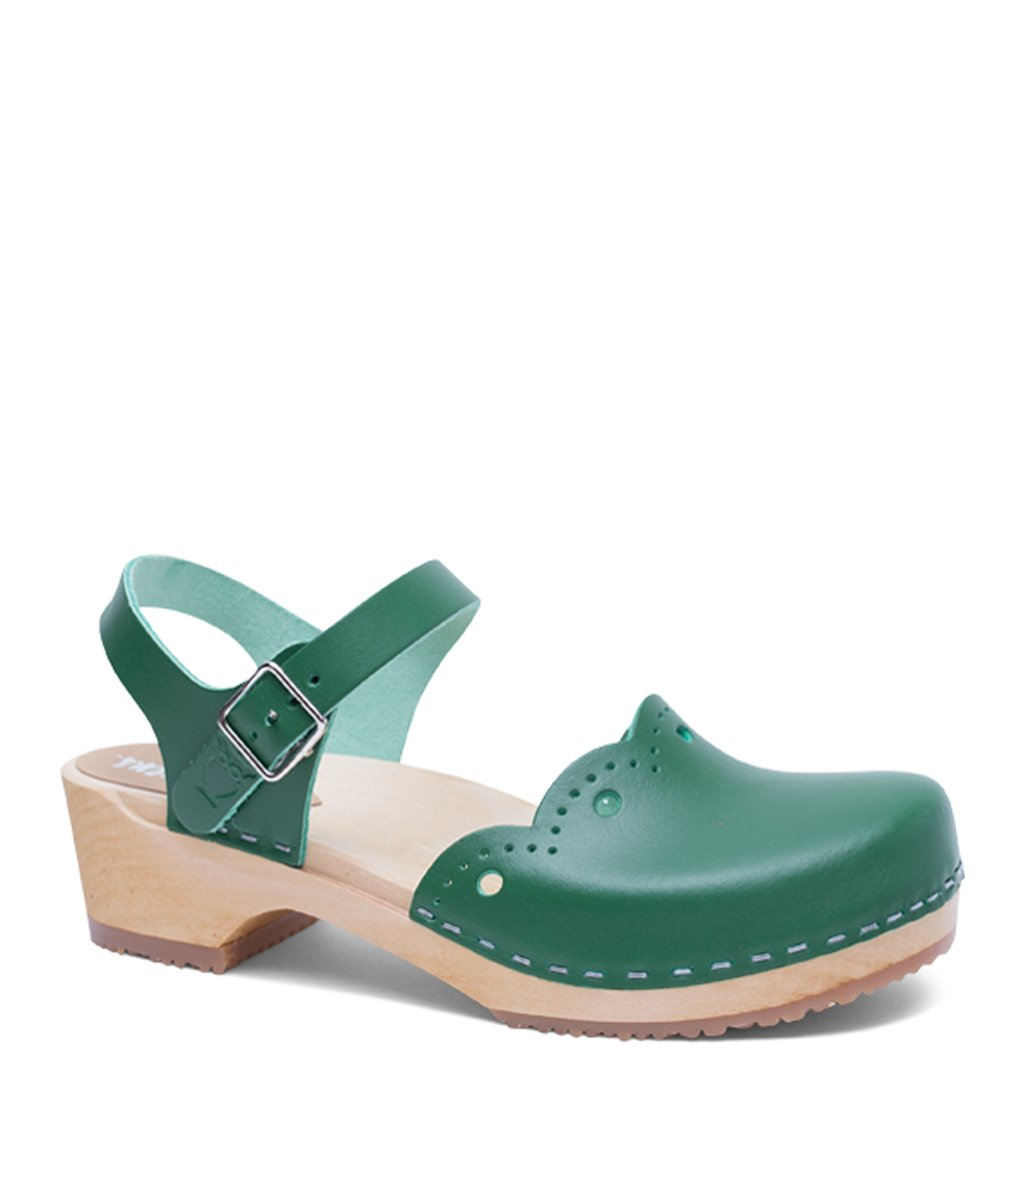 Sandgrens Swedish Wooden Low Heel Clog Sandals For Women | Milan In Strong Green, Size US 10 EU 40